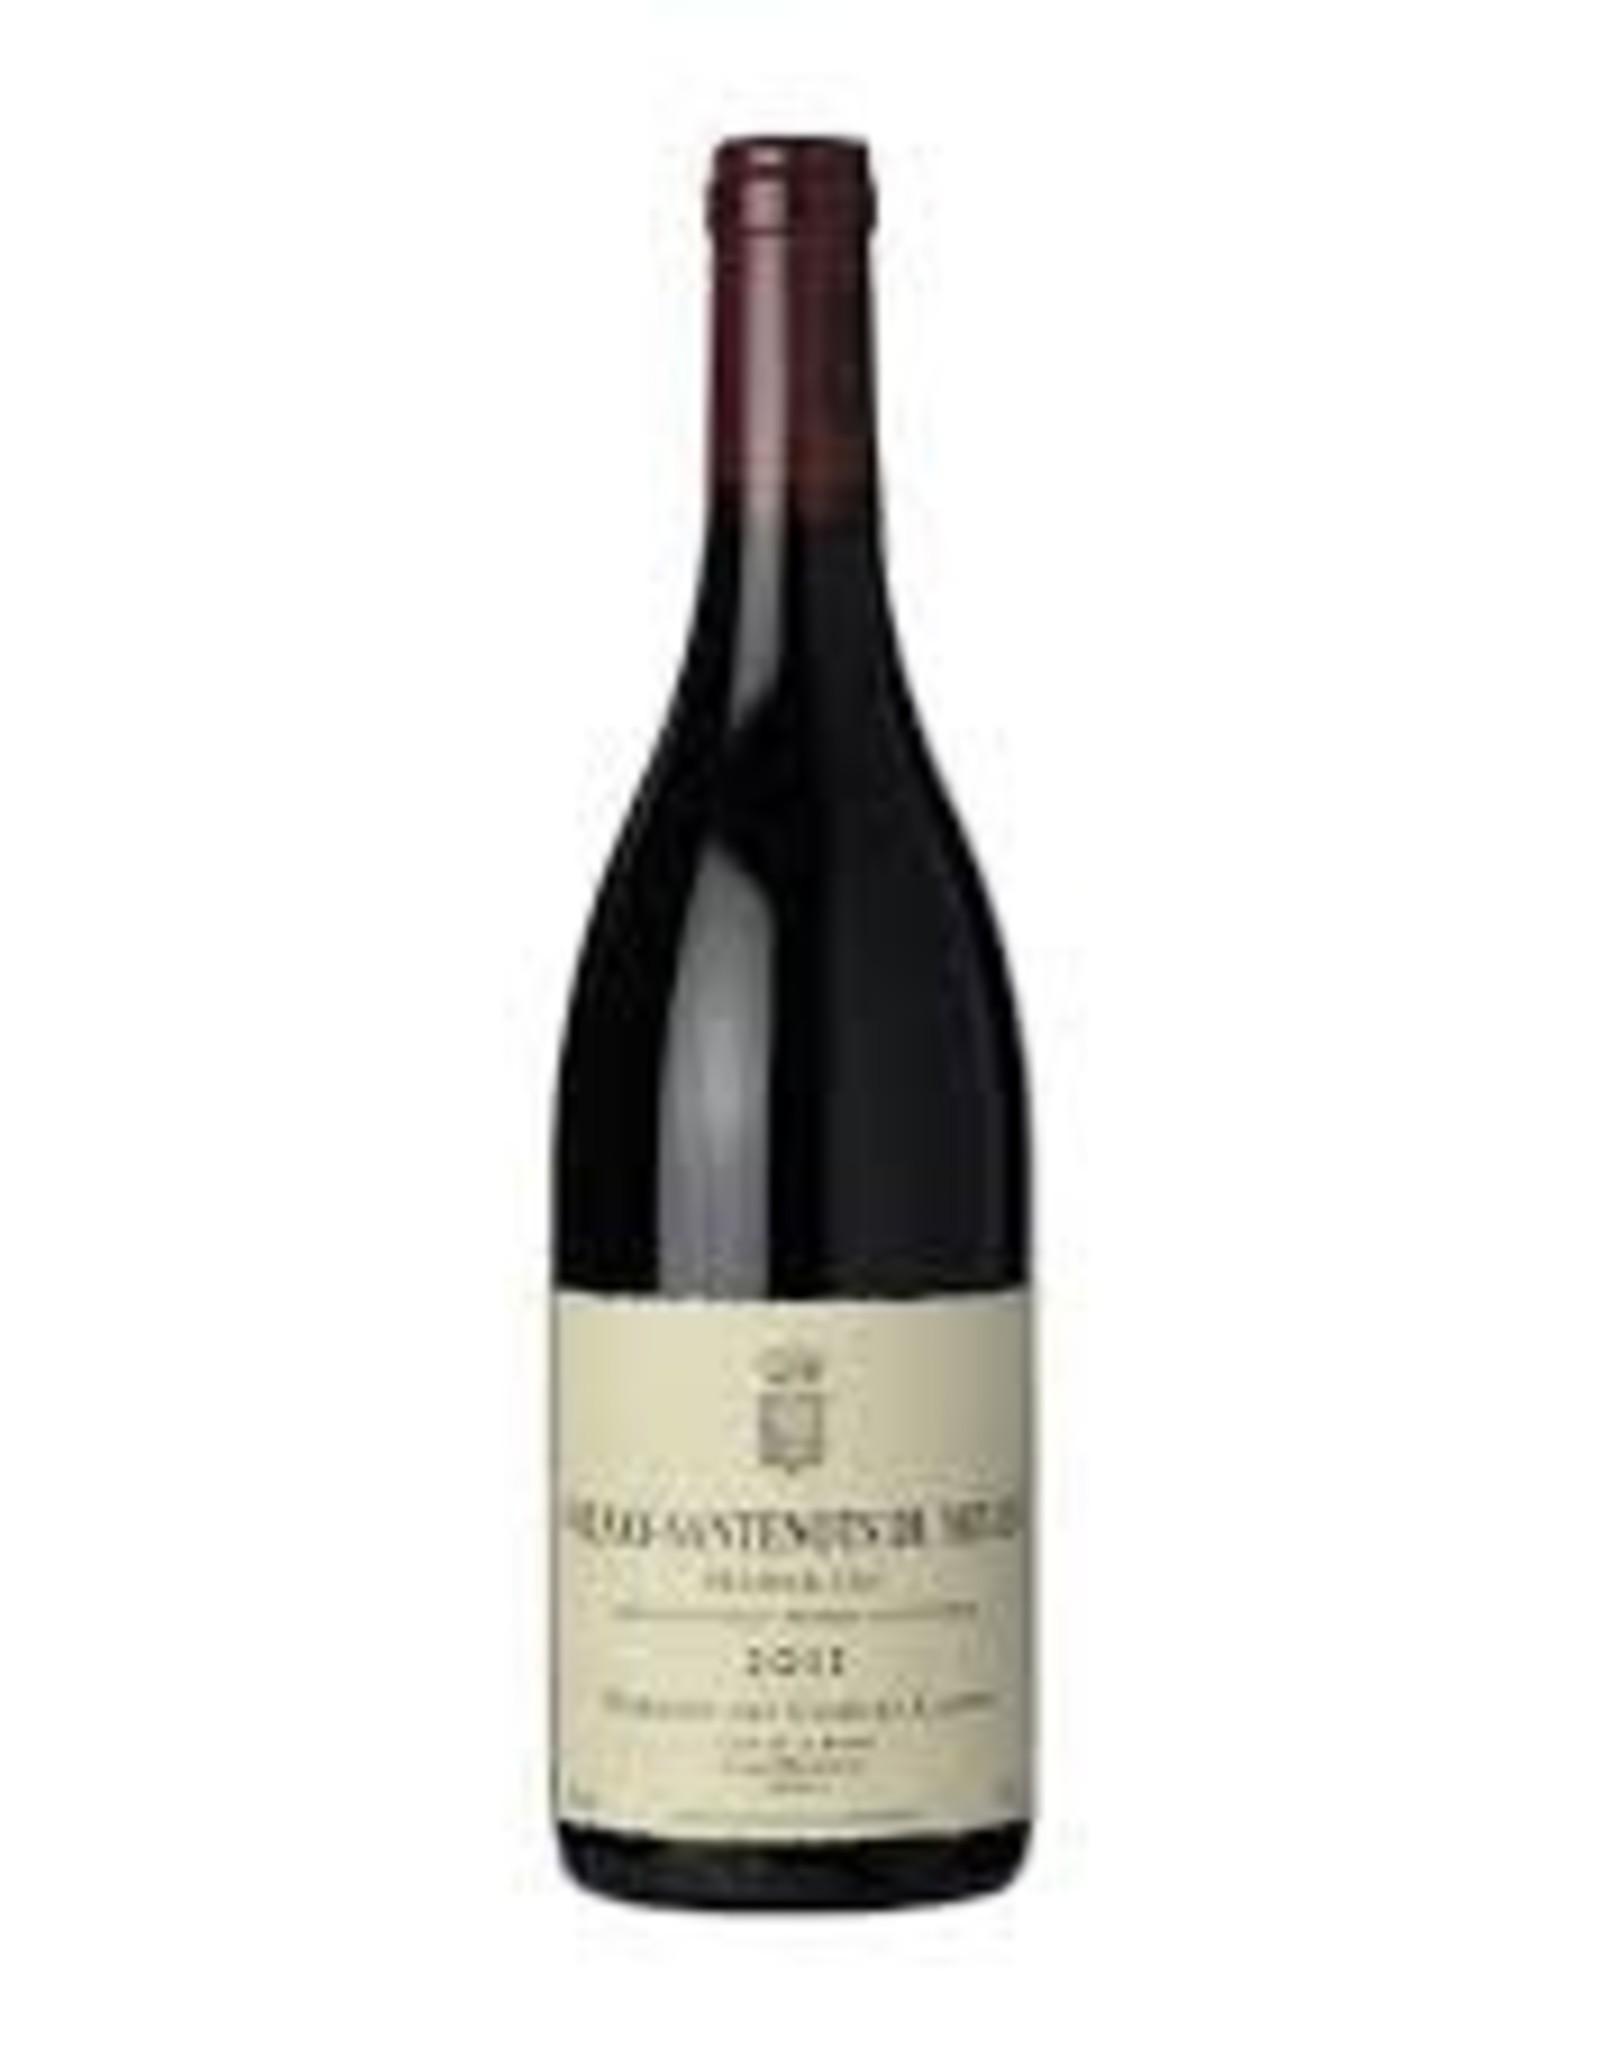 R Burgundy, Volnay-SANTENOTS DU MILIEU 1r, Comtes Lafon 2012